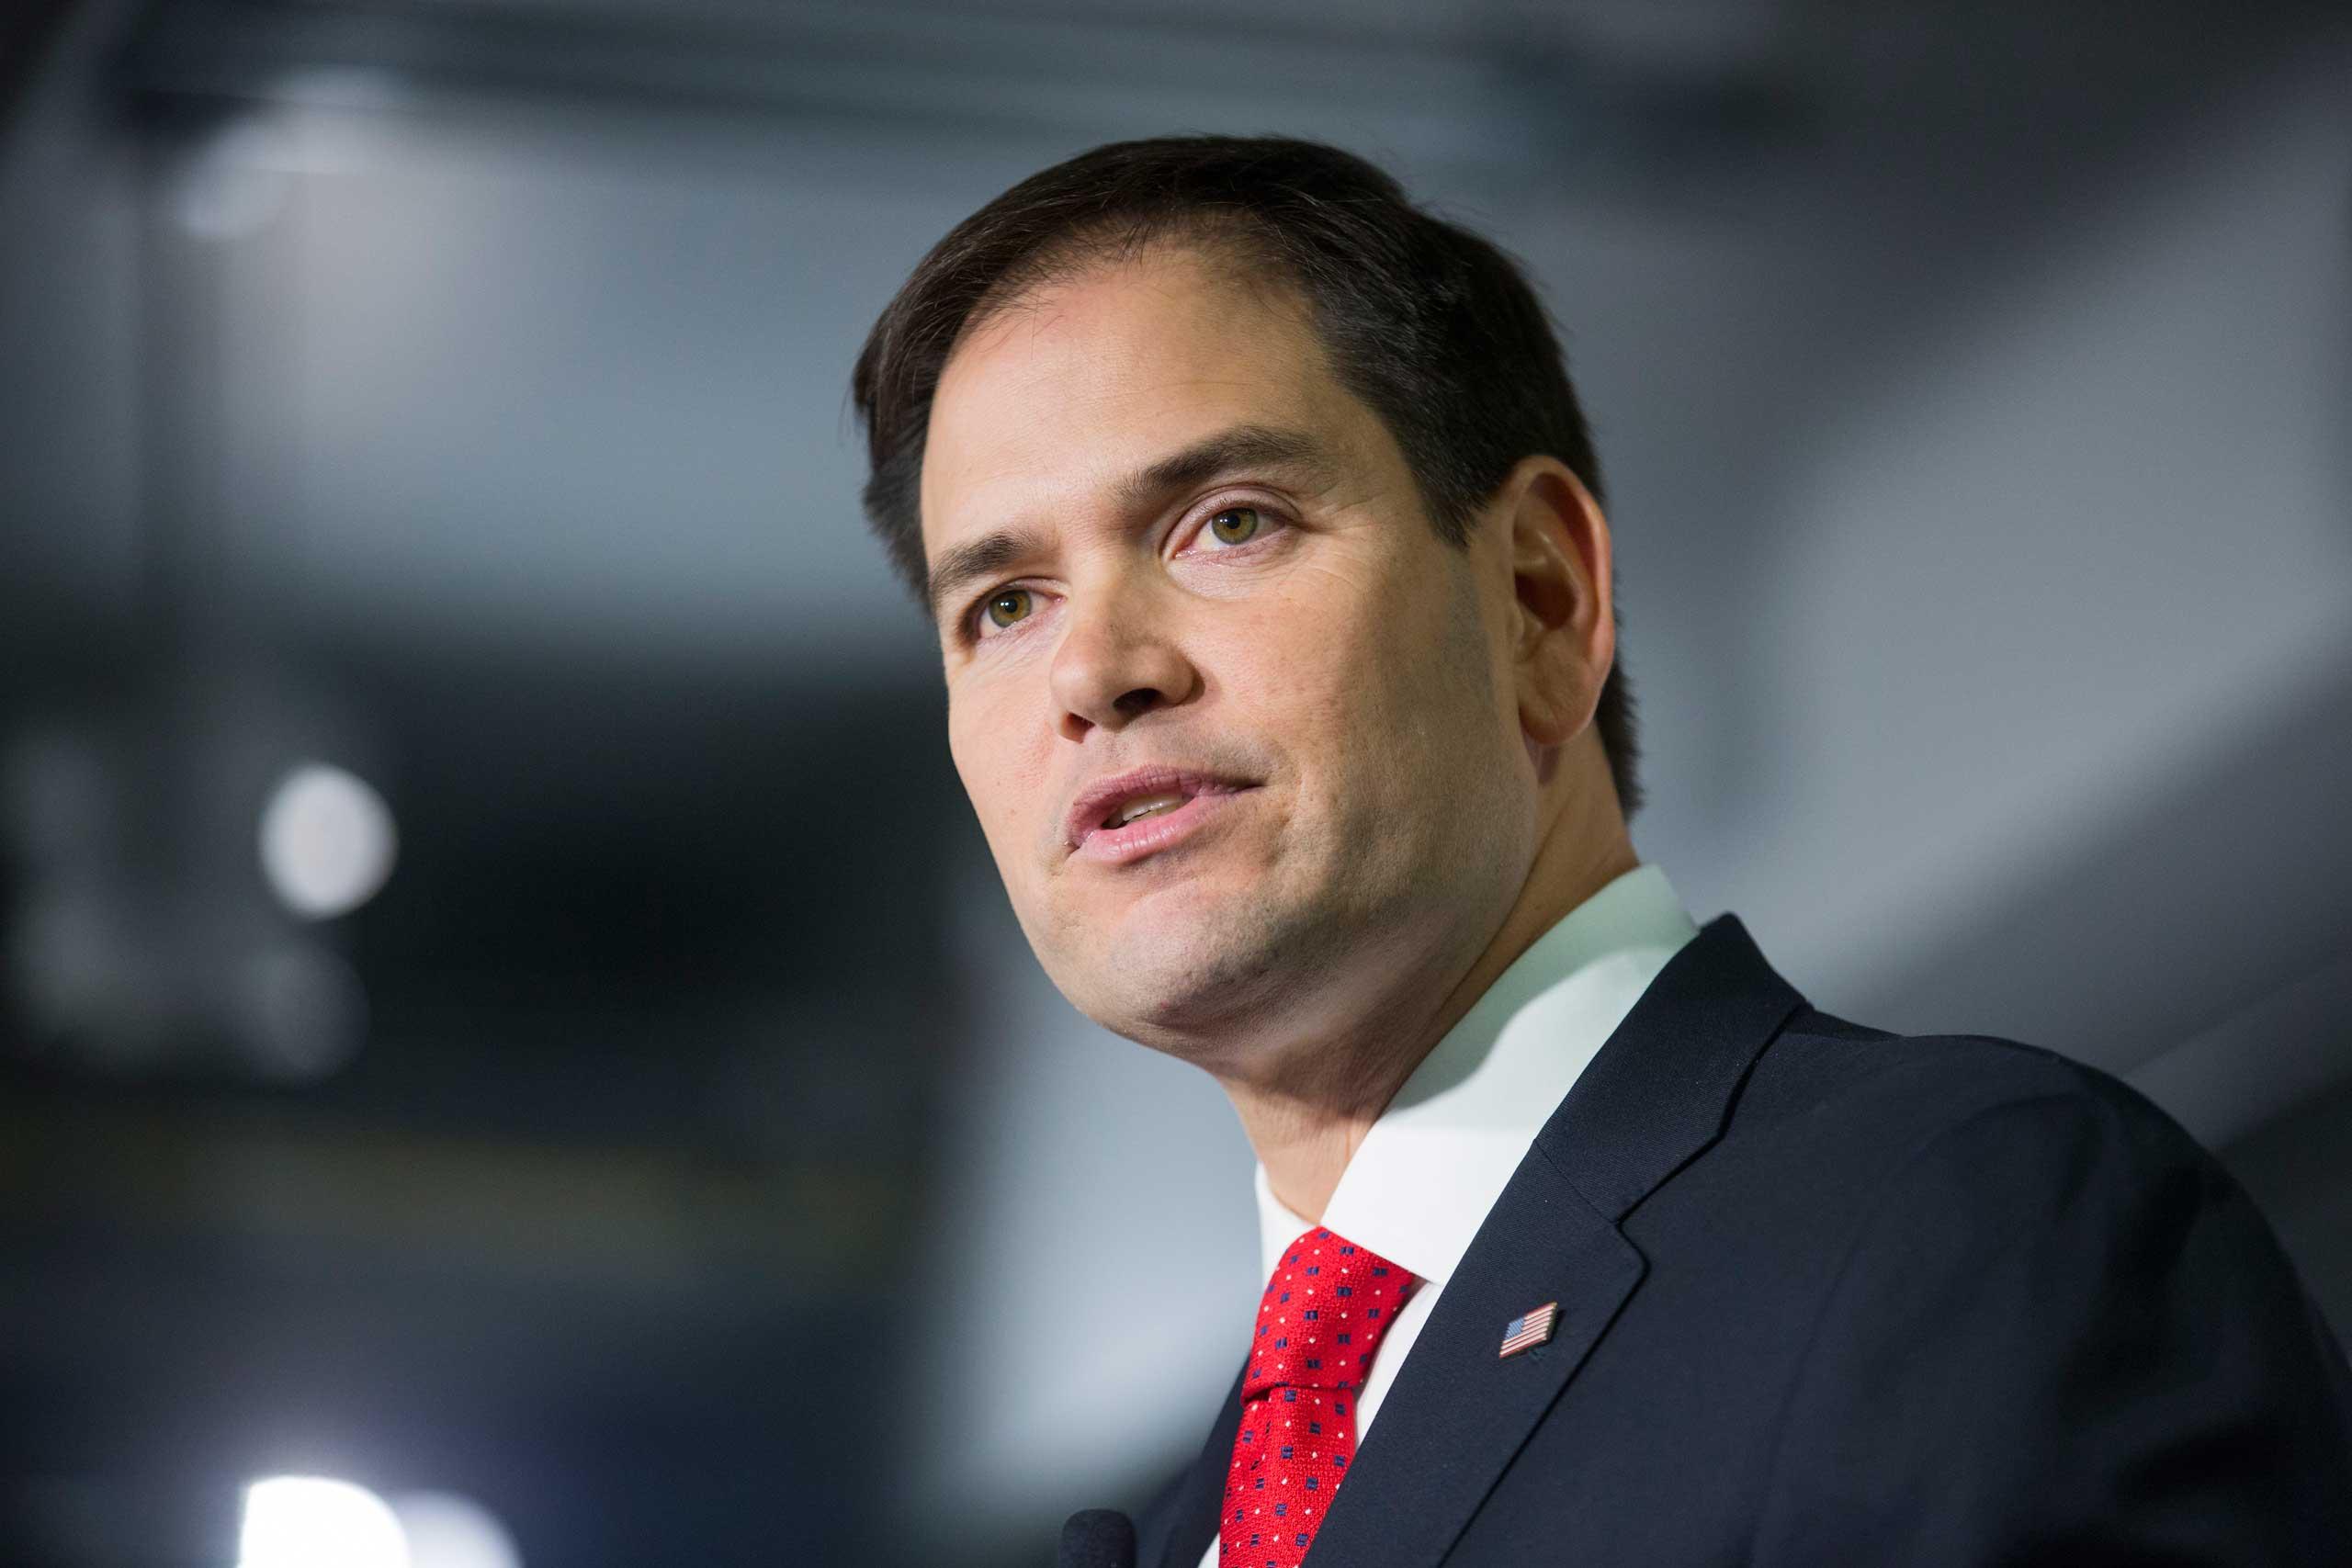 U.S. Senator Marco Rubio speaks on strategies for sparking economic growth in Washington on March 10, 2014.